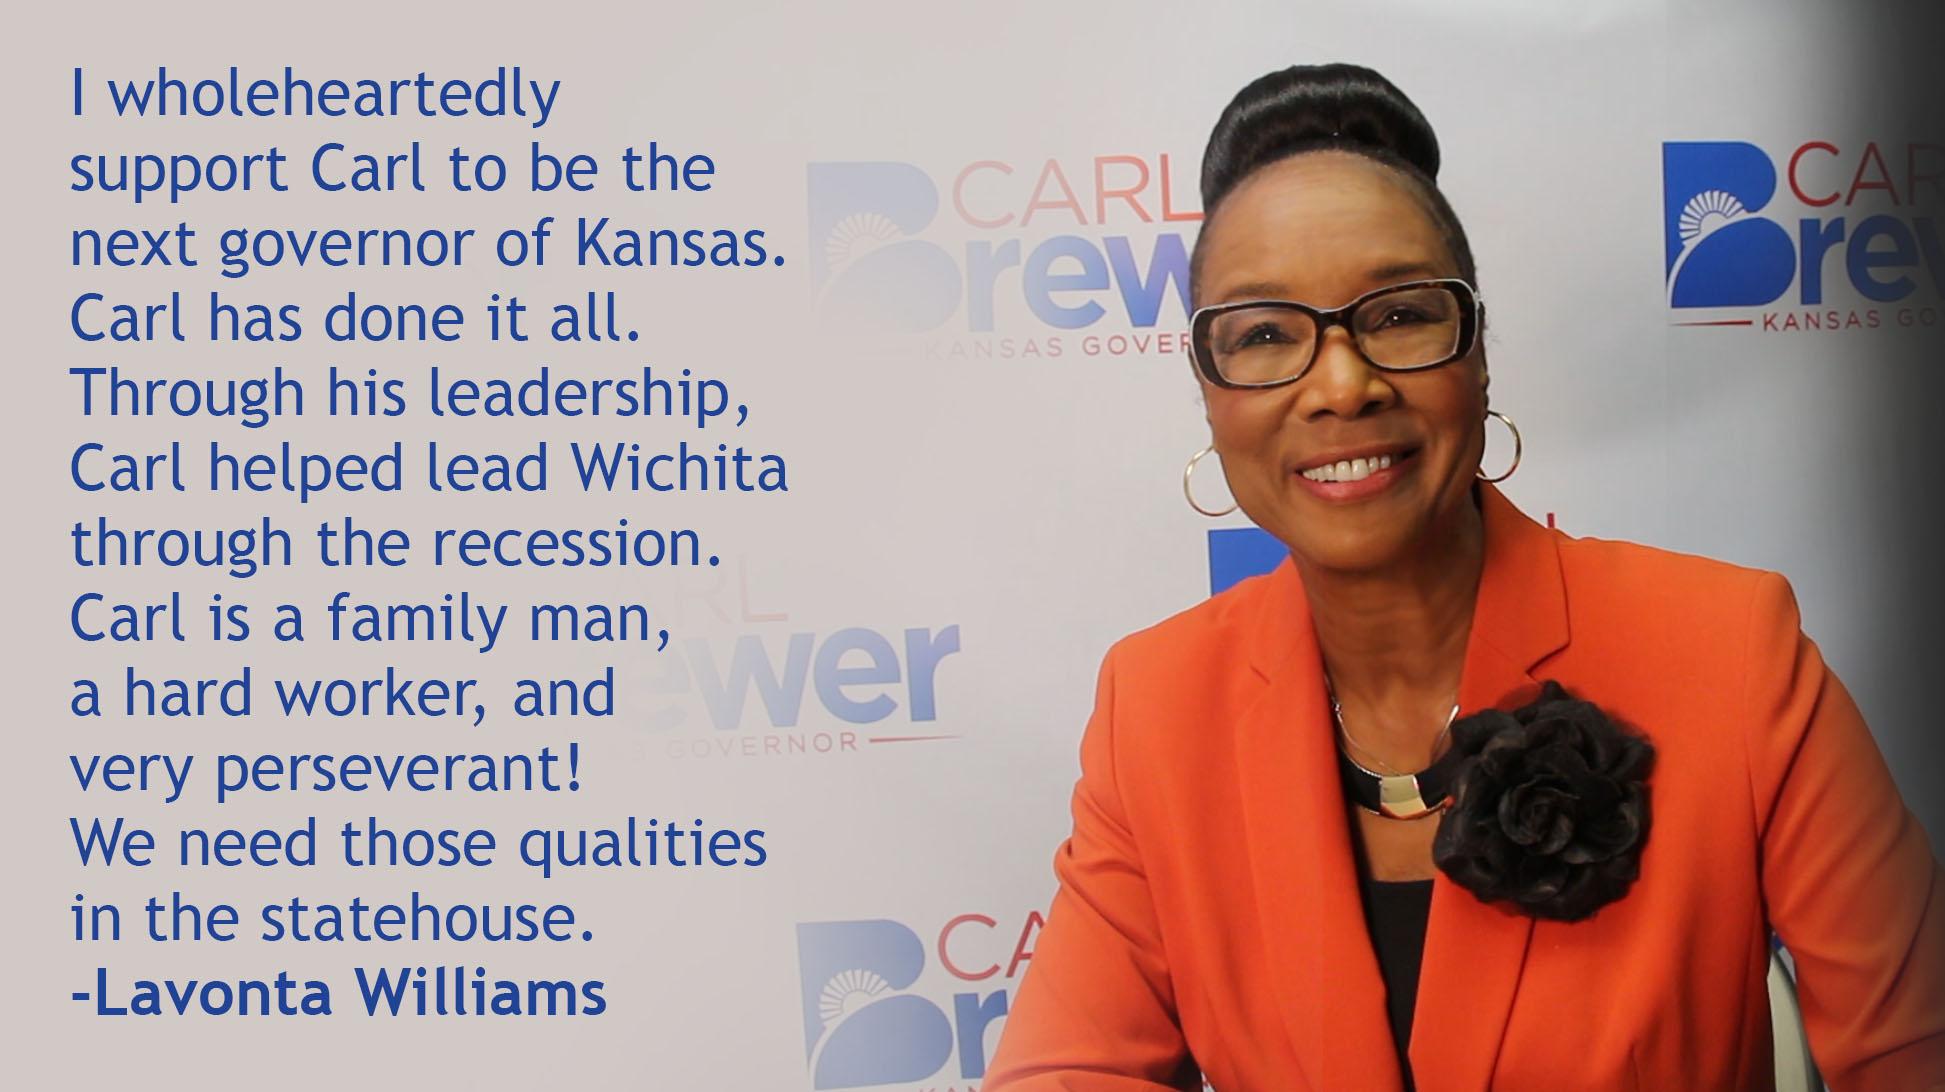 Former Wichita Vice Mayor Lavonta Williams